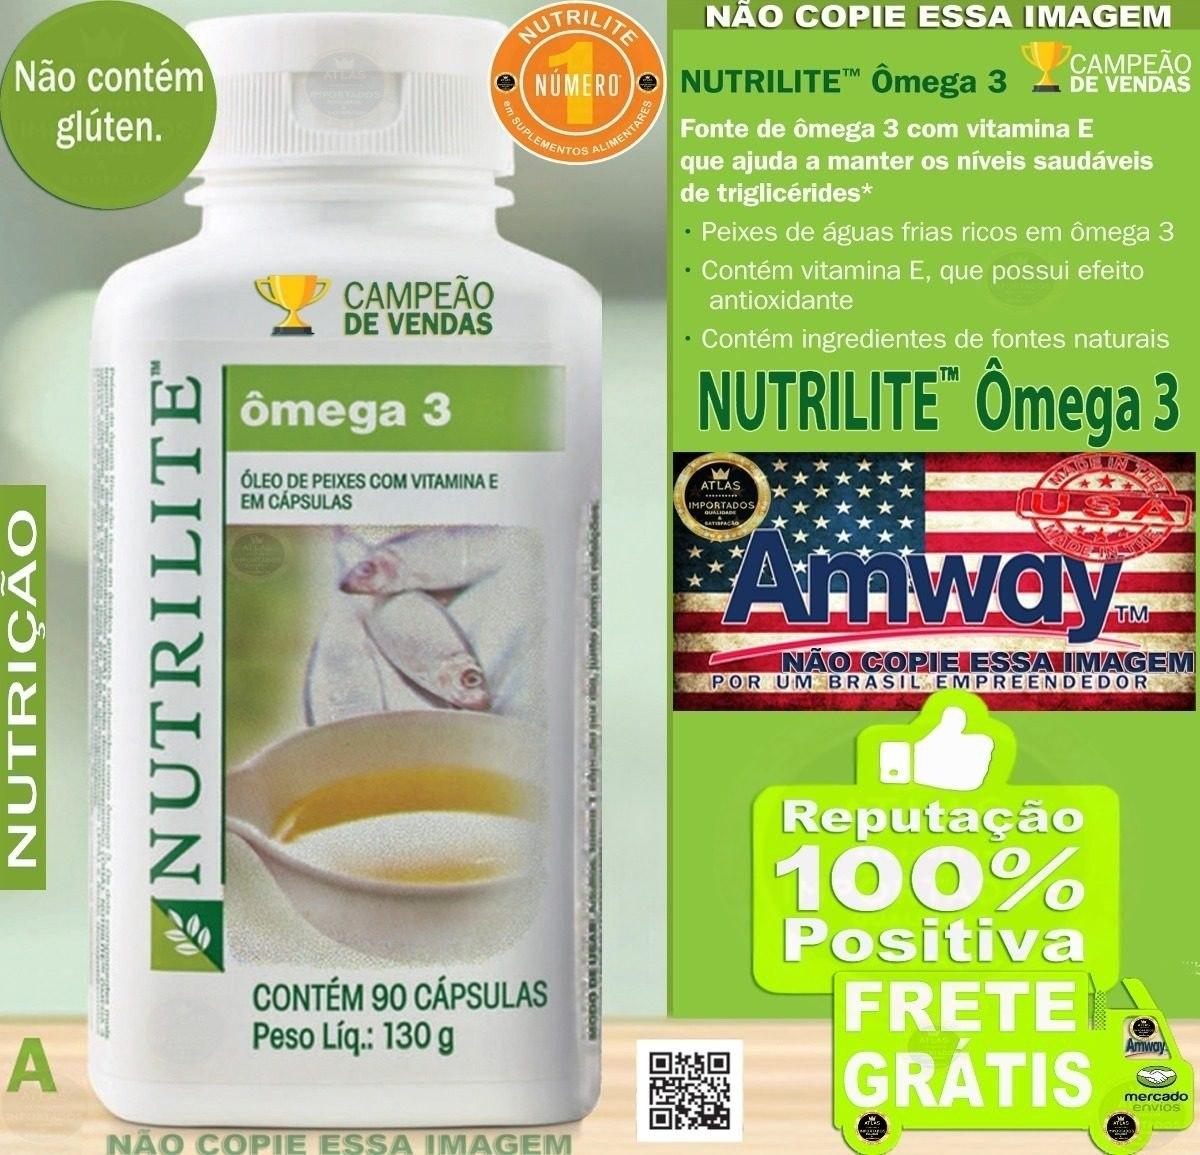 ff476608c amway omega 3 oleo de peixe c  vit. e nutrilite. Carregando zoom.